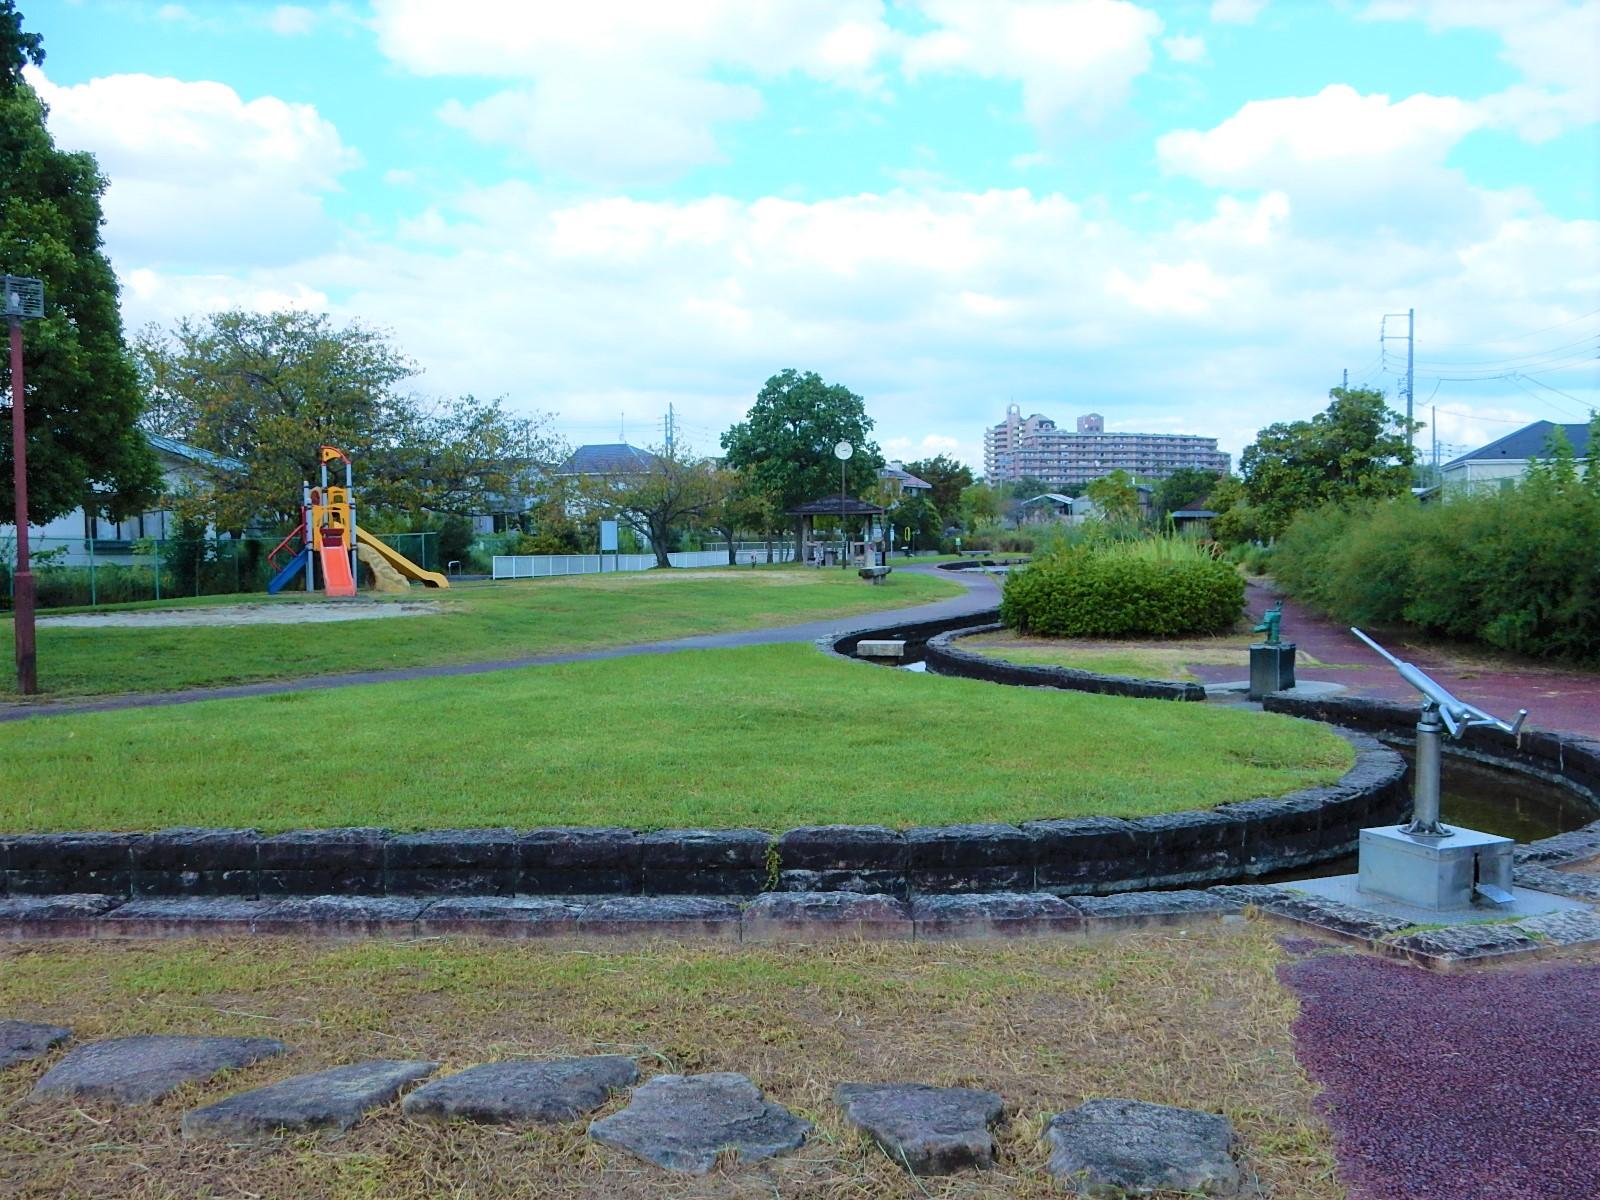 <p>2021年9月撮影<br /> 親水公園:涼松せせらぎの道(愛知郡東郷町春木)</p>